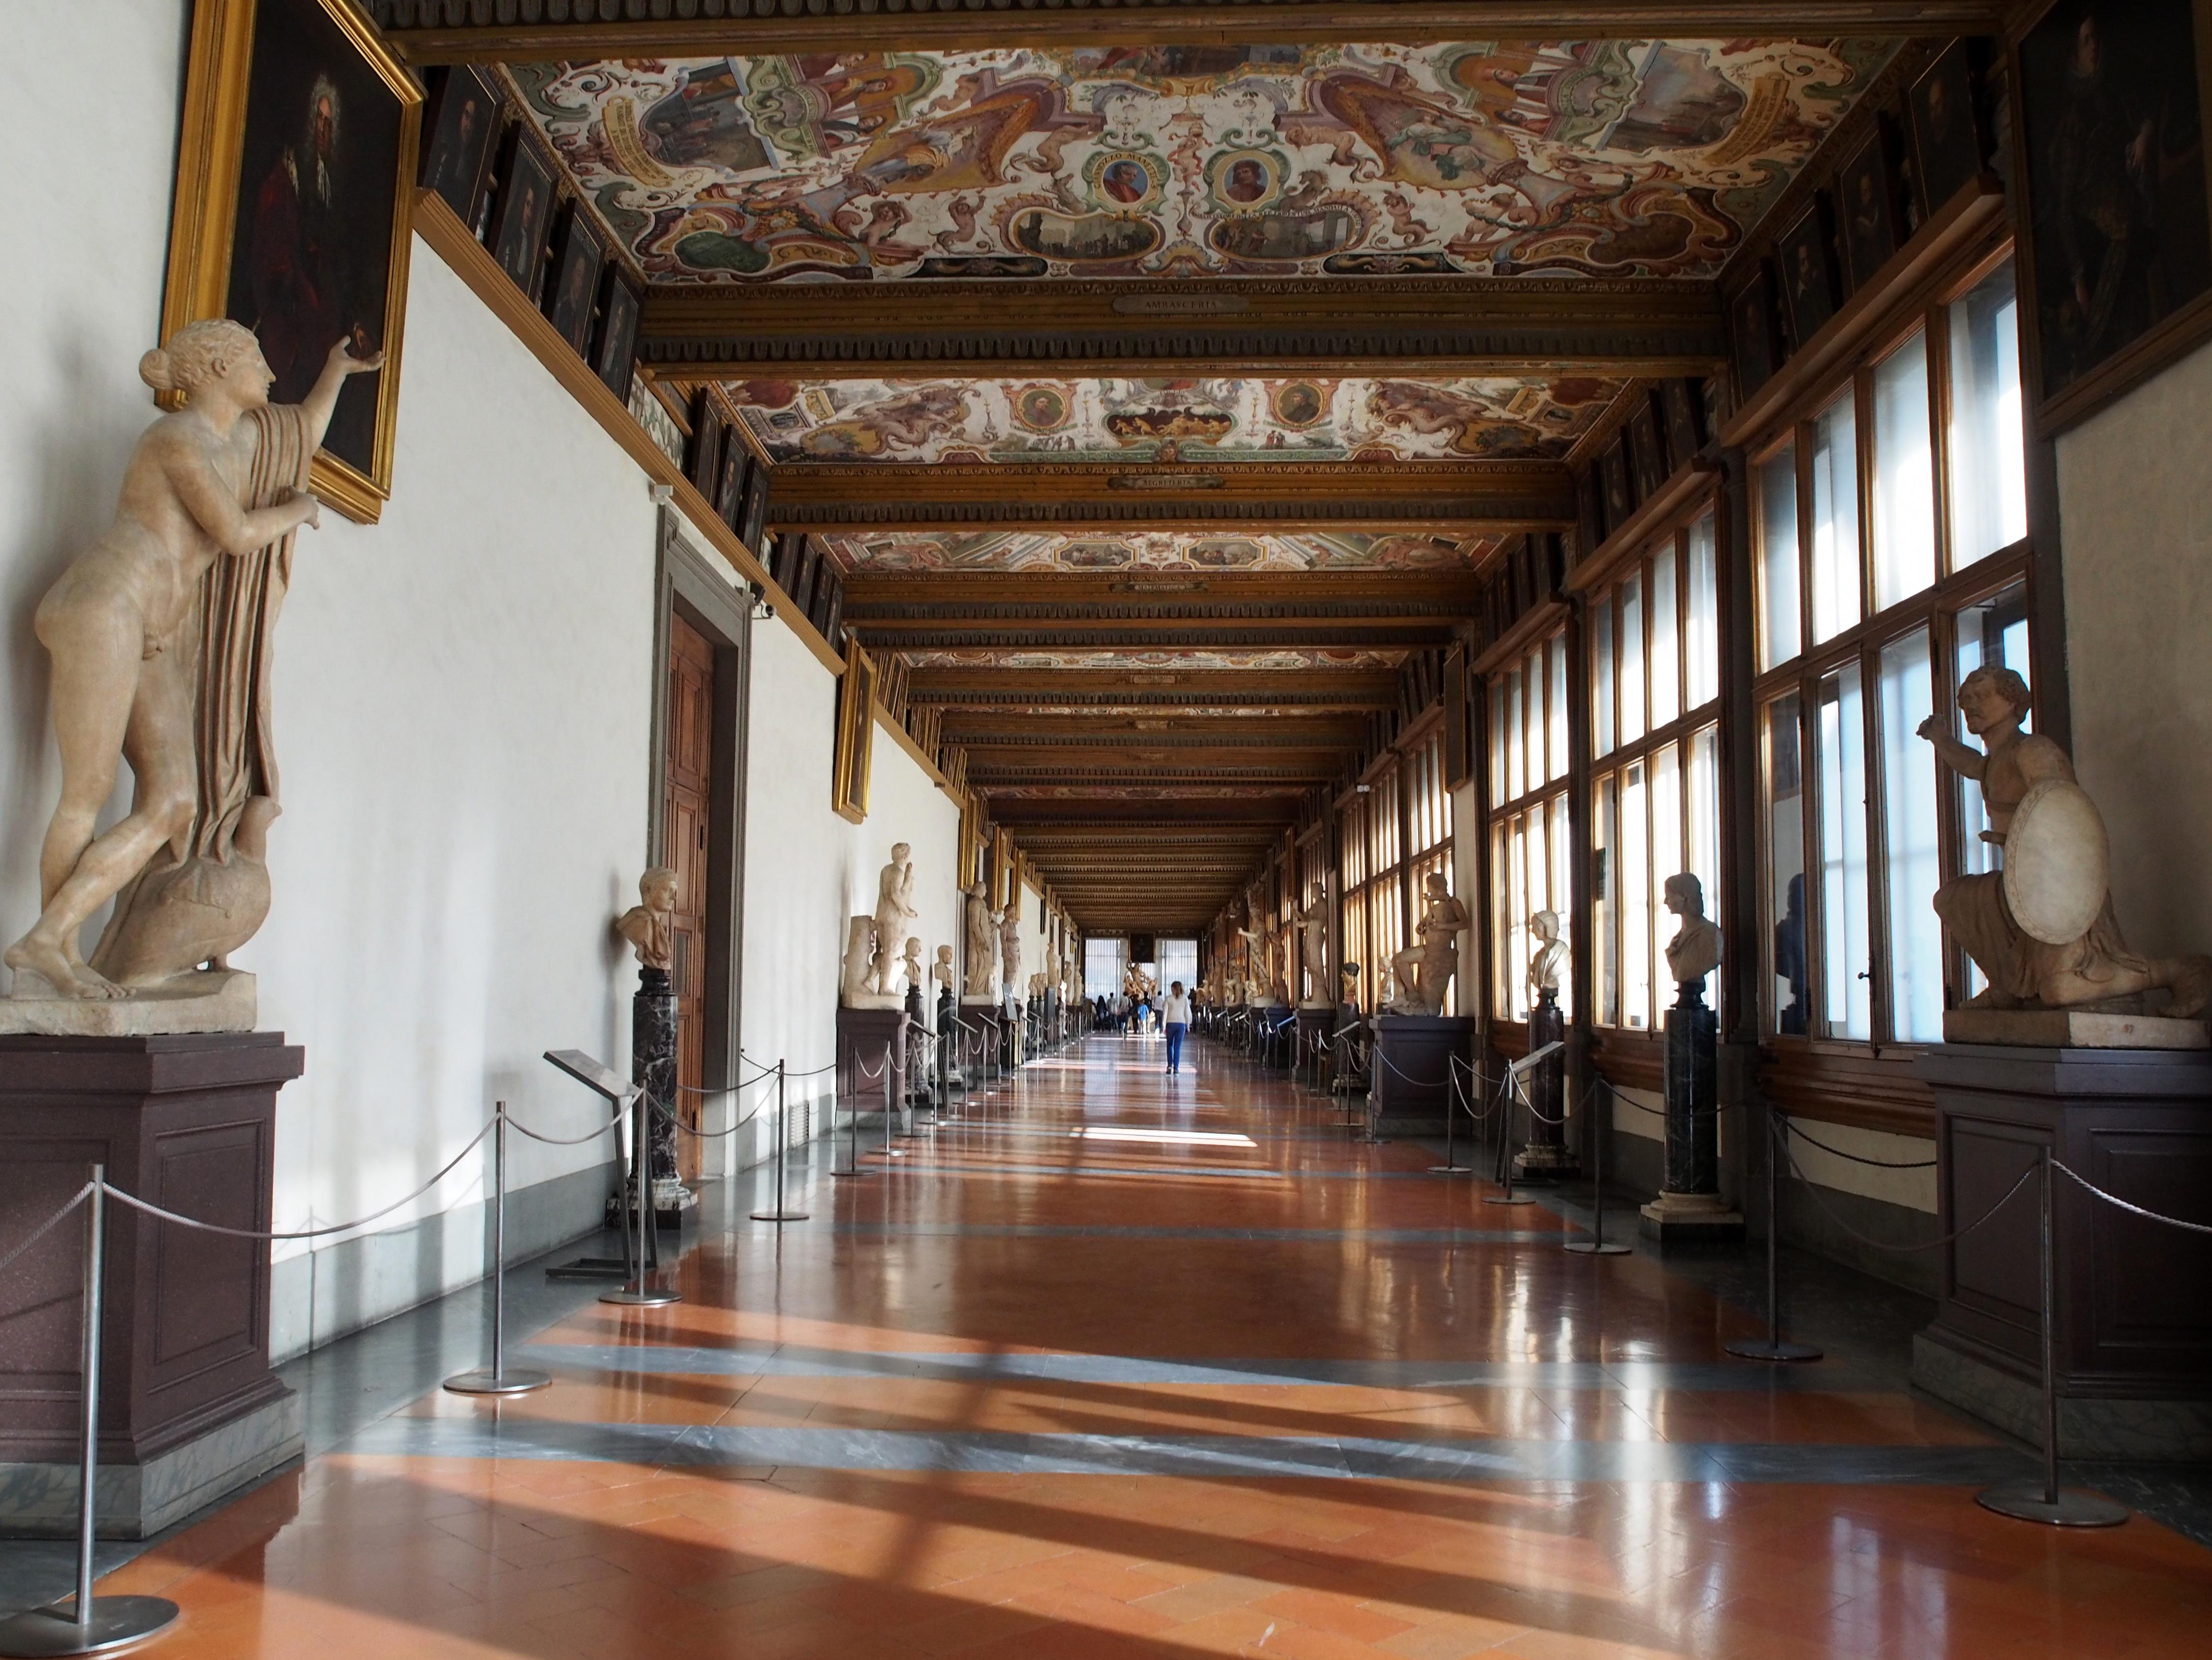 Uffizi Gallery hallway.JPG